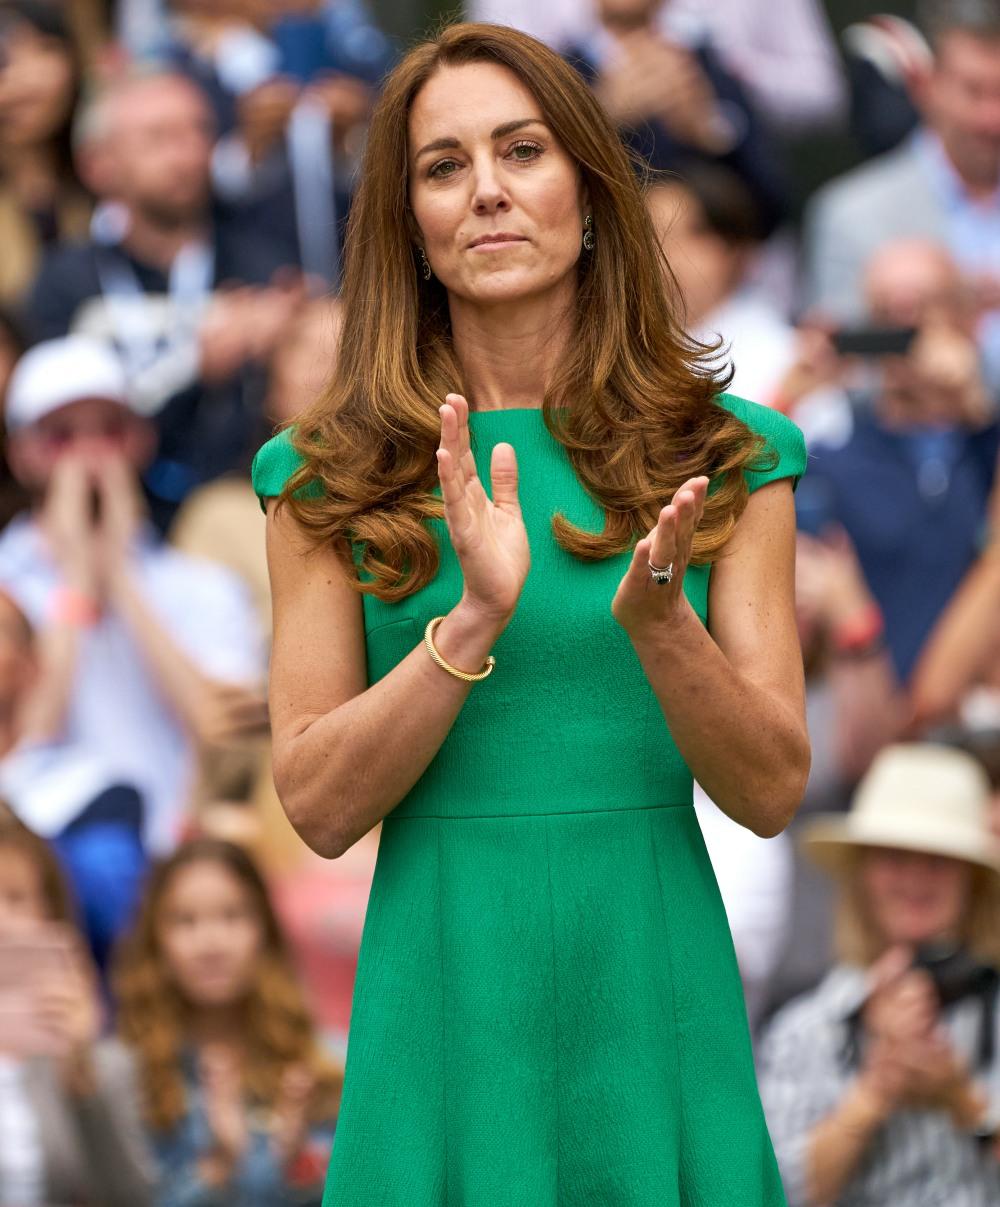 DESCRIPTION at the 2021 Wimbledon Championships